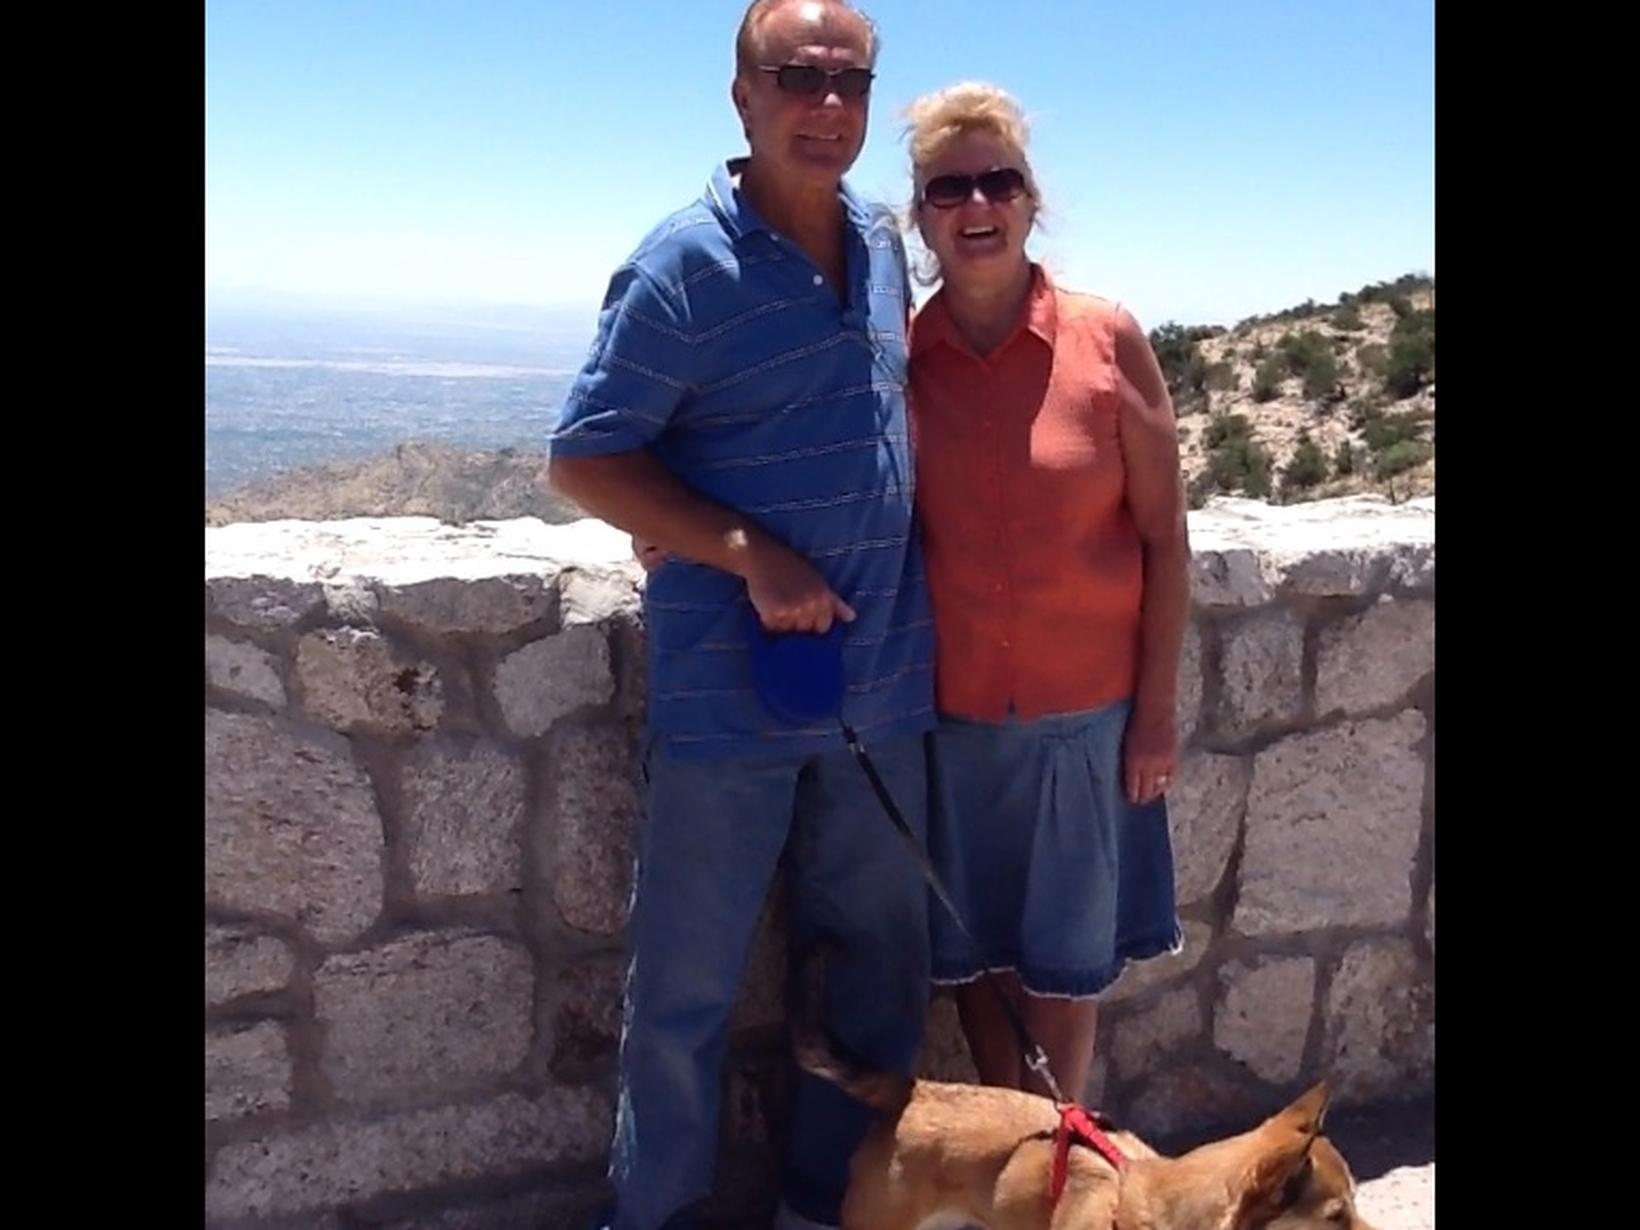 Wilson and marlene & Marlene from Green Valley, Arizona, United States